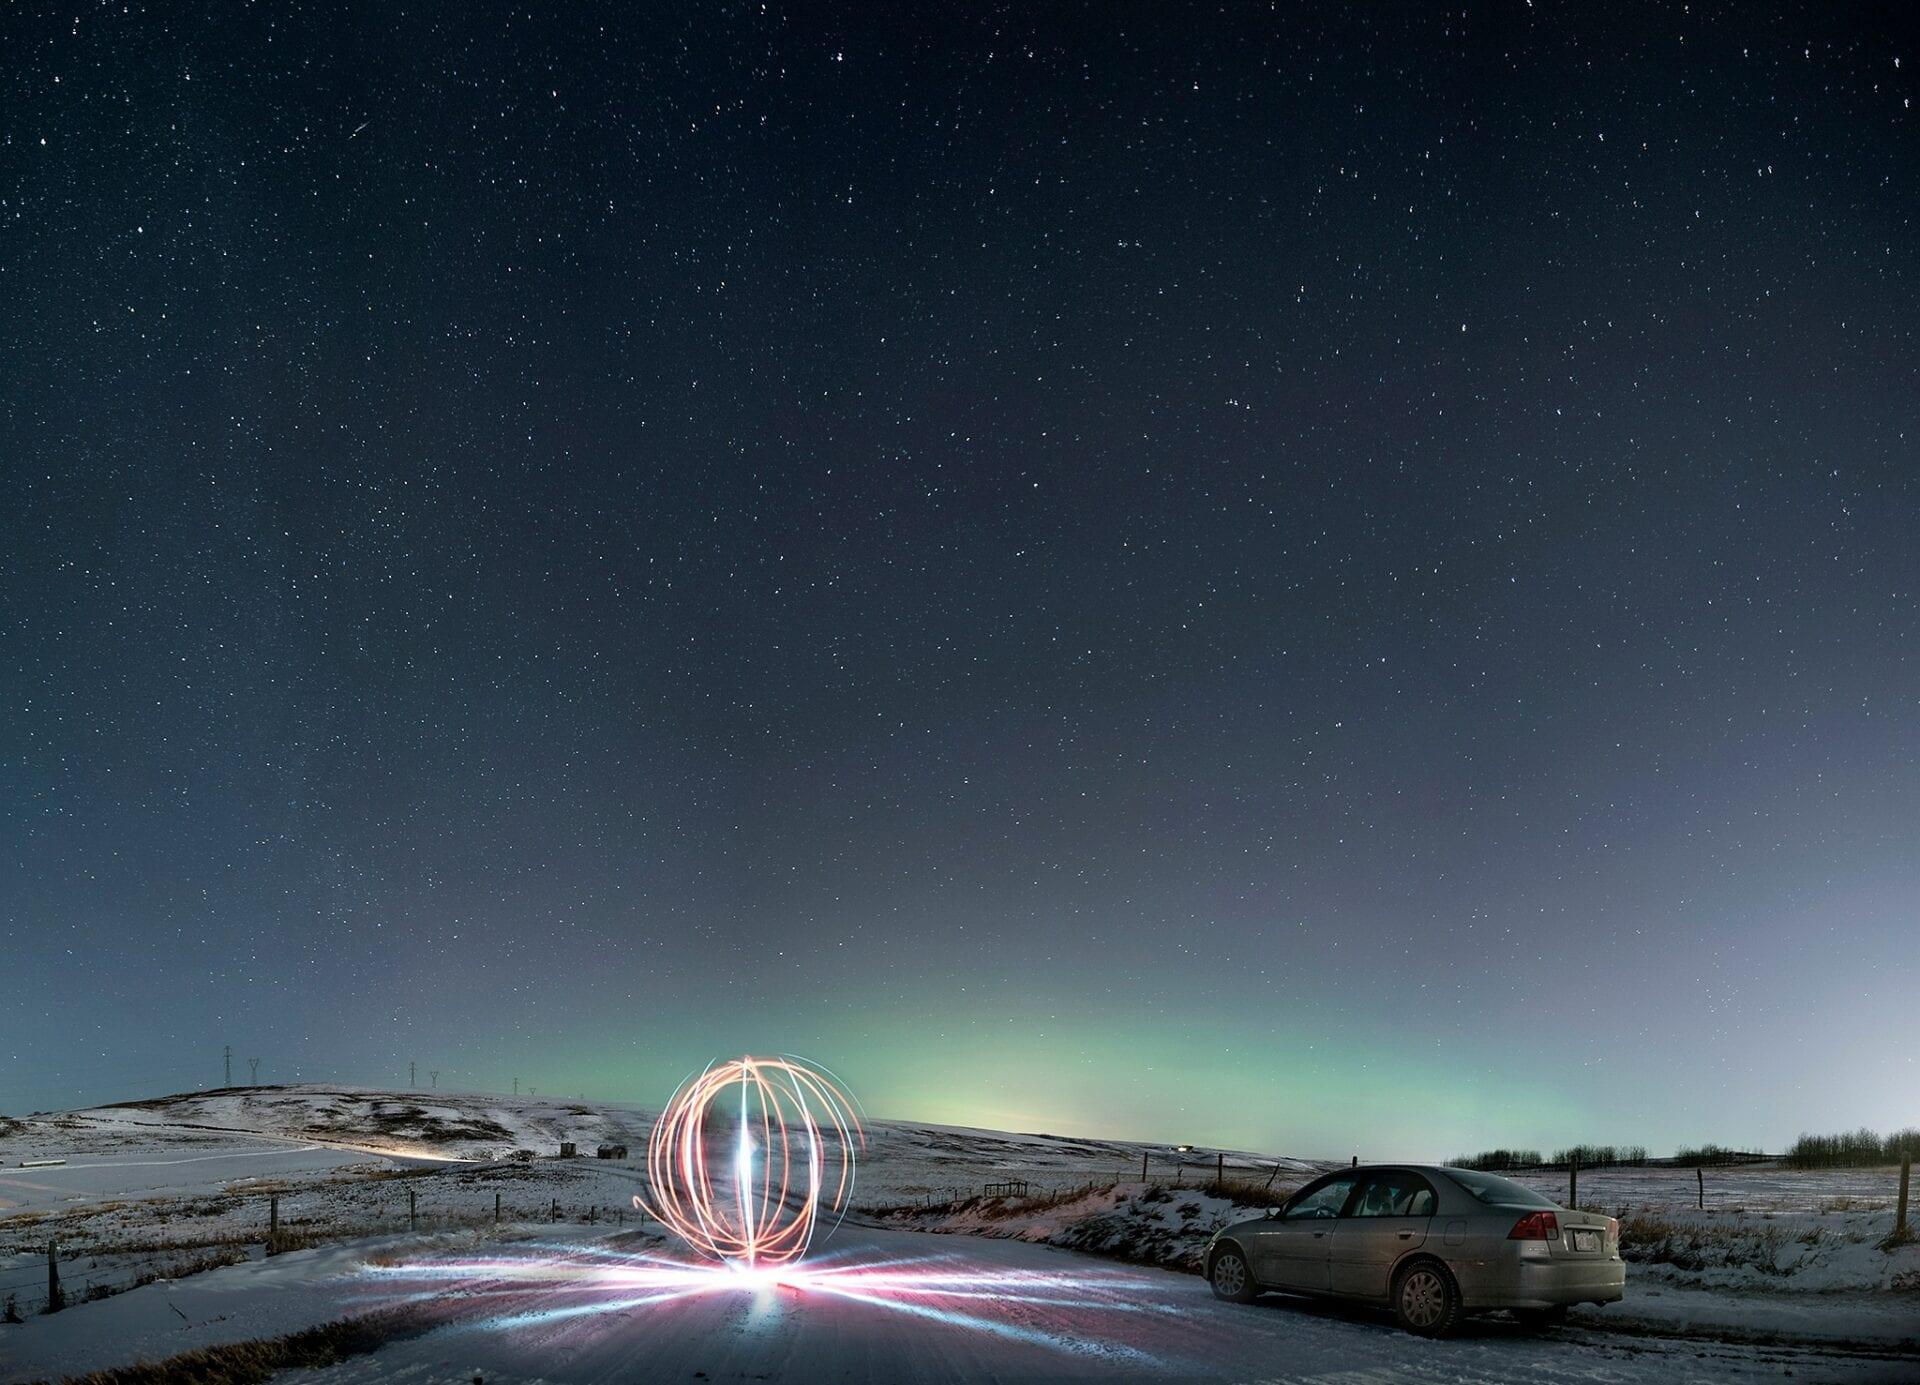 Edmonton Calgary Airdrie Aurora Northern Lights Light painting-_0002